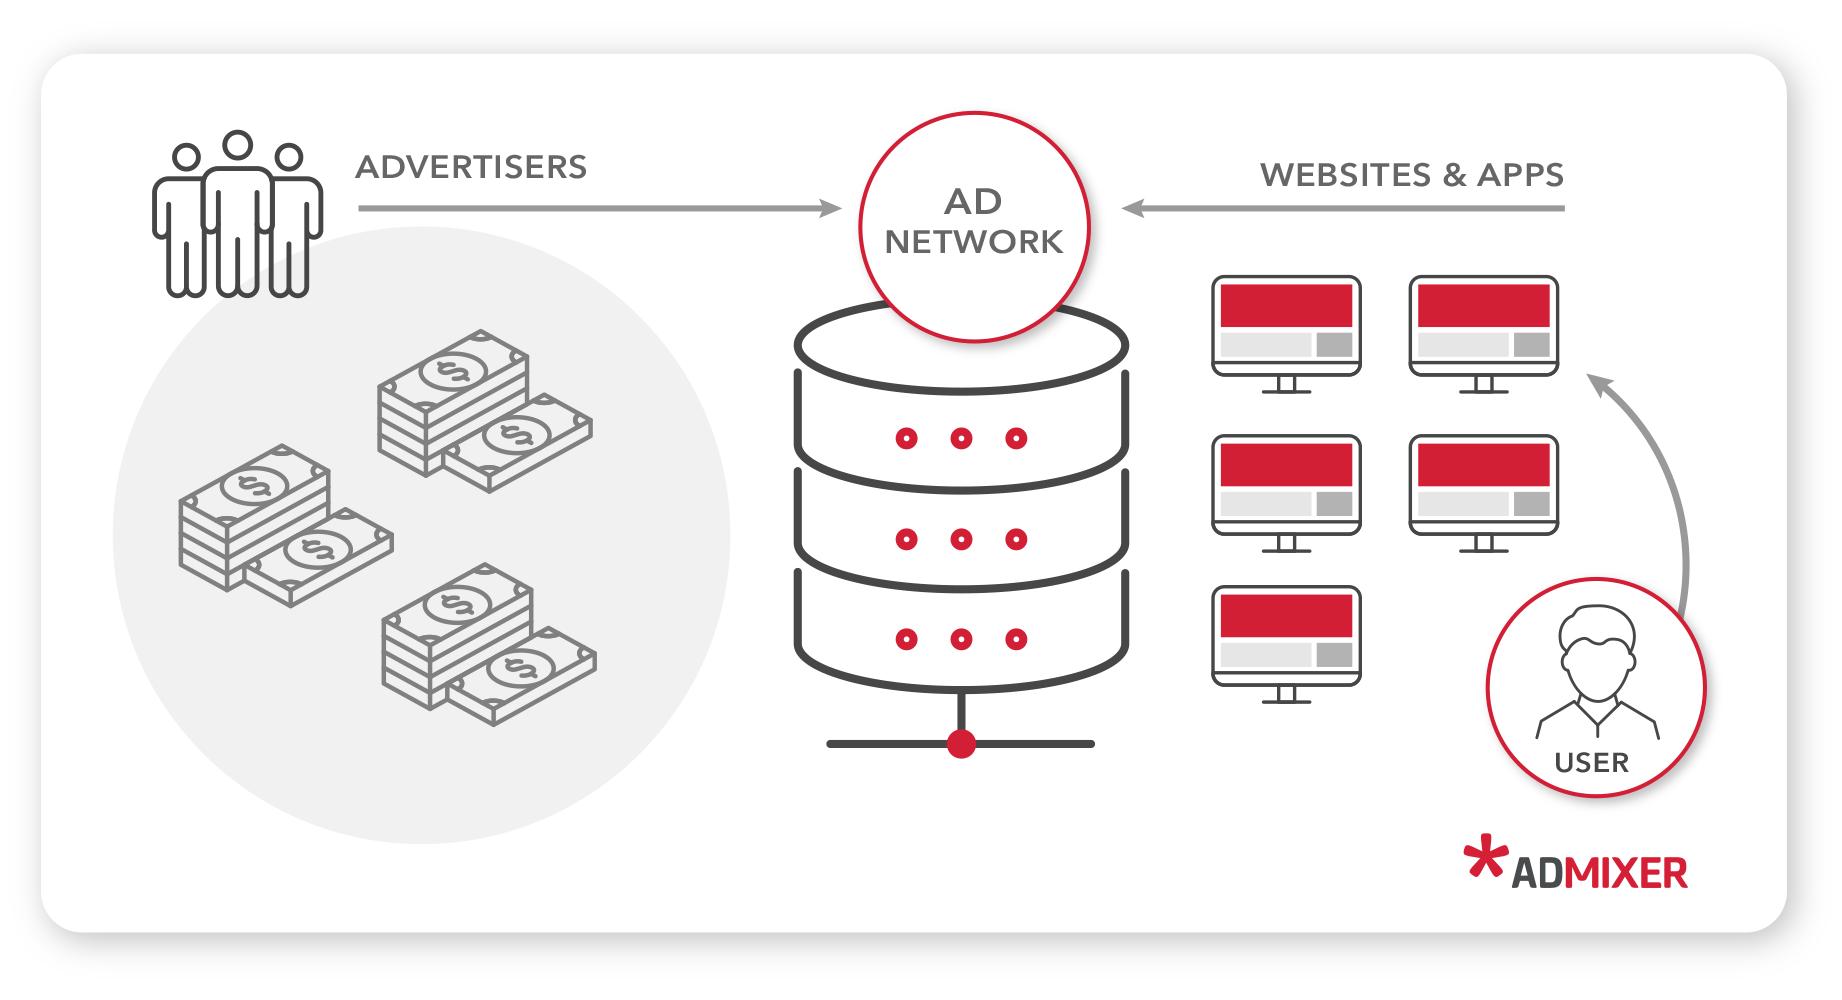 Ad network - Admixer blog